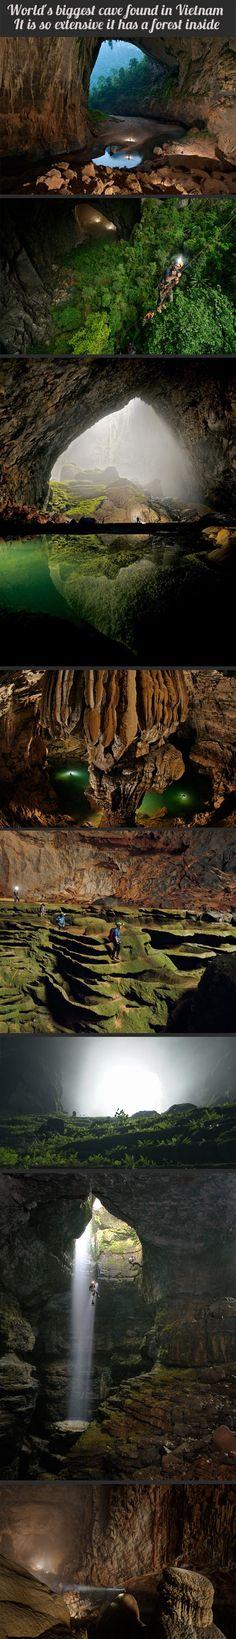 Worlds biggest cave. Sounds like SKYRIM